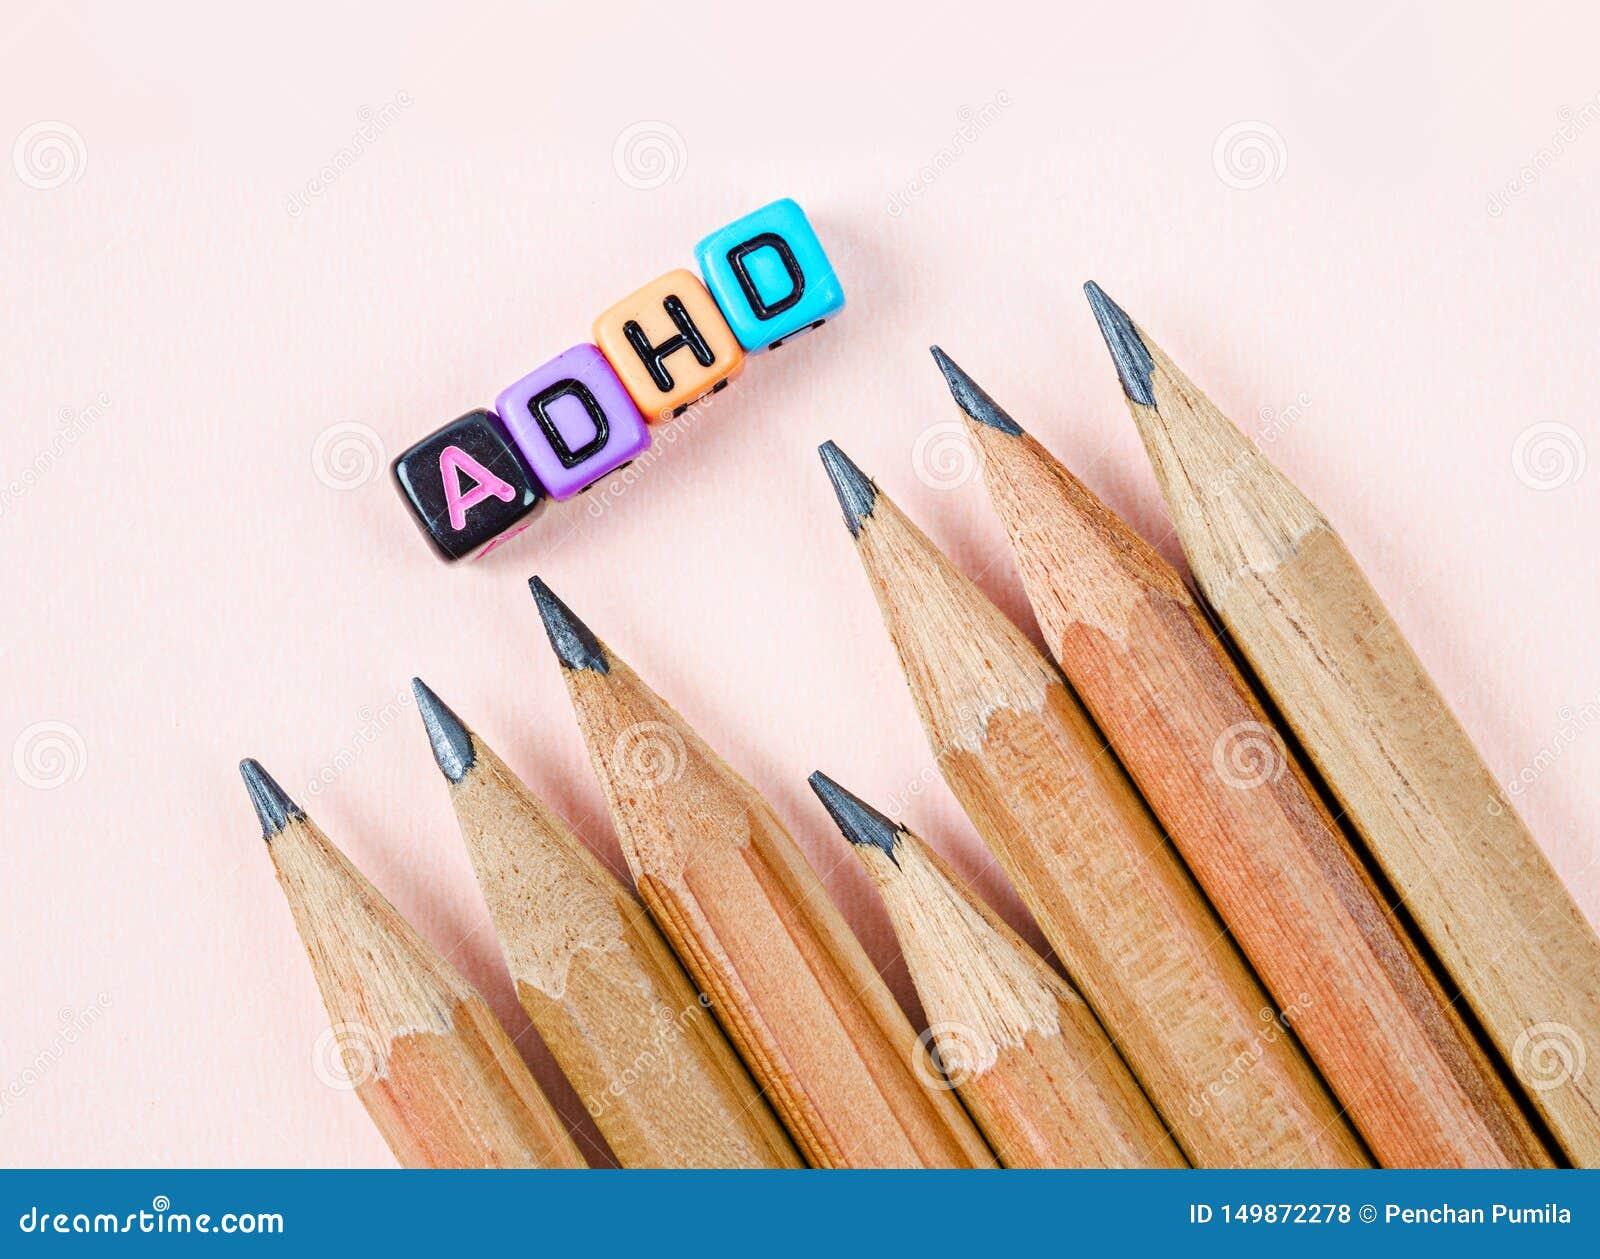 Desordem da hiperatividade do deficit de aten??o ou conceito de ADHD